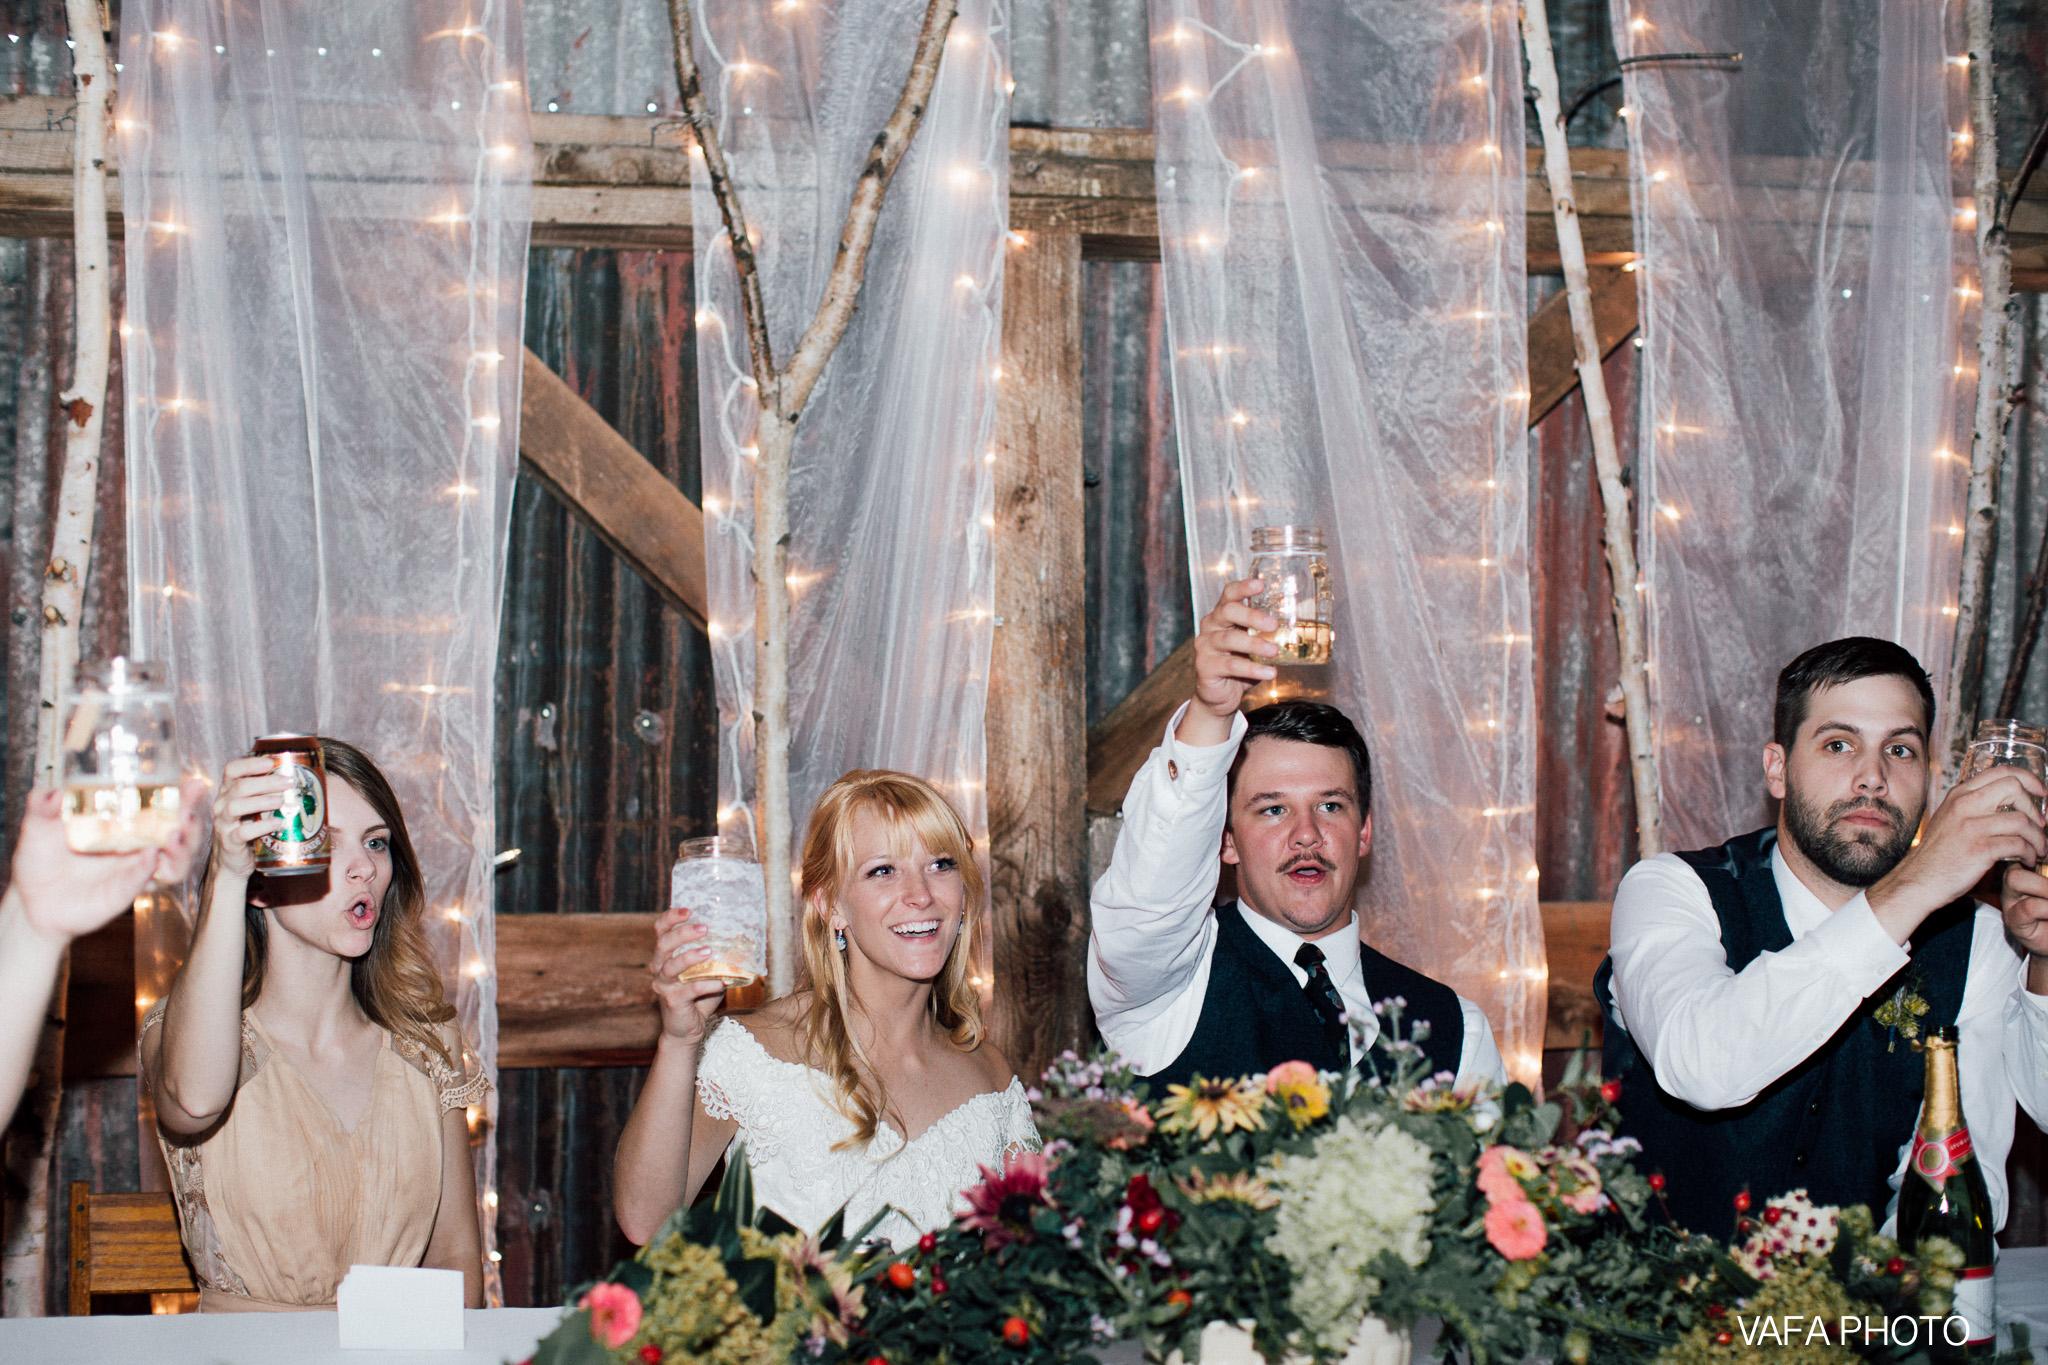 Belsolda-Farm-Wedding-Christy-Eric-Vafa-Photo-618.jpg